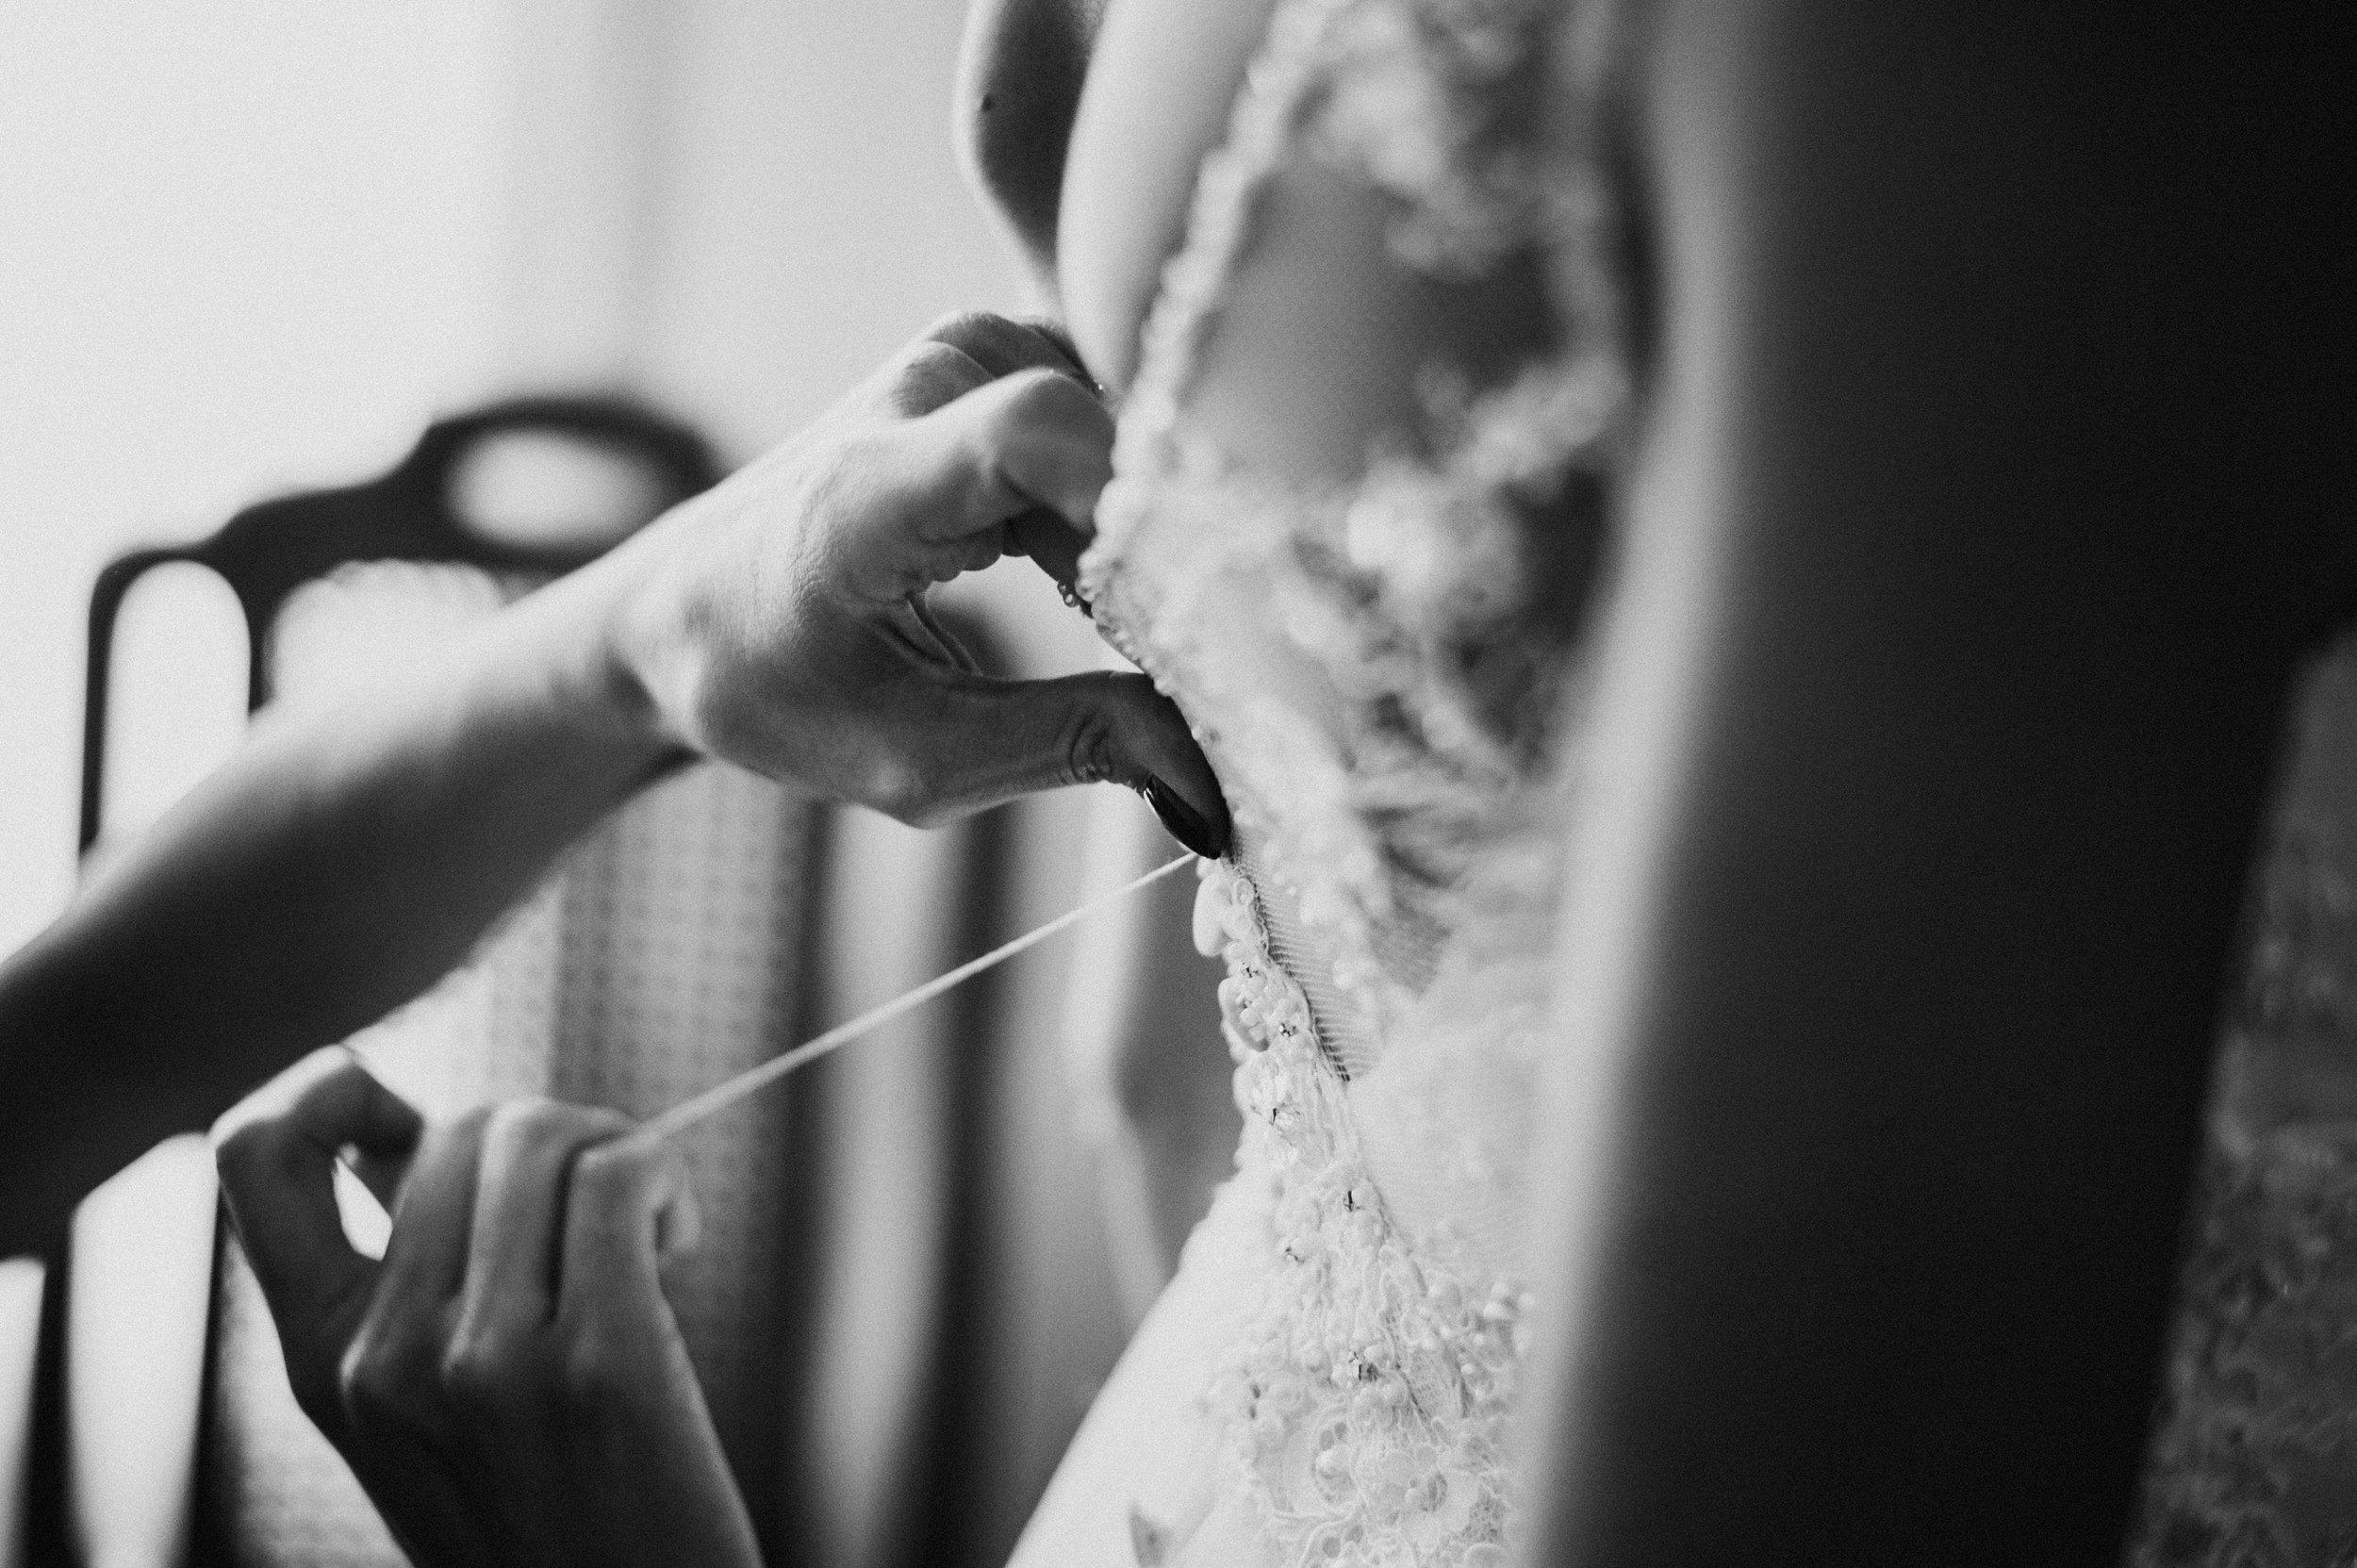 fotografo de bodas en carlos paz cordoba 009.JPG